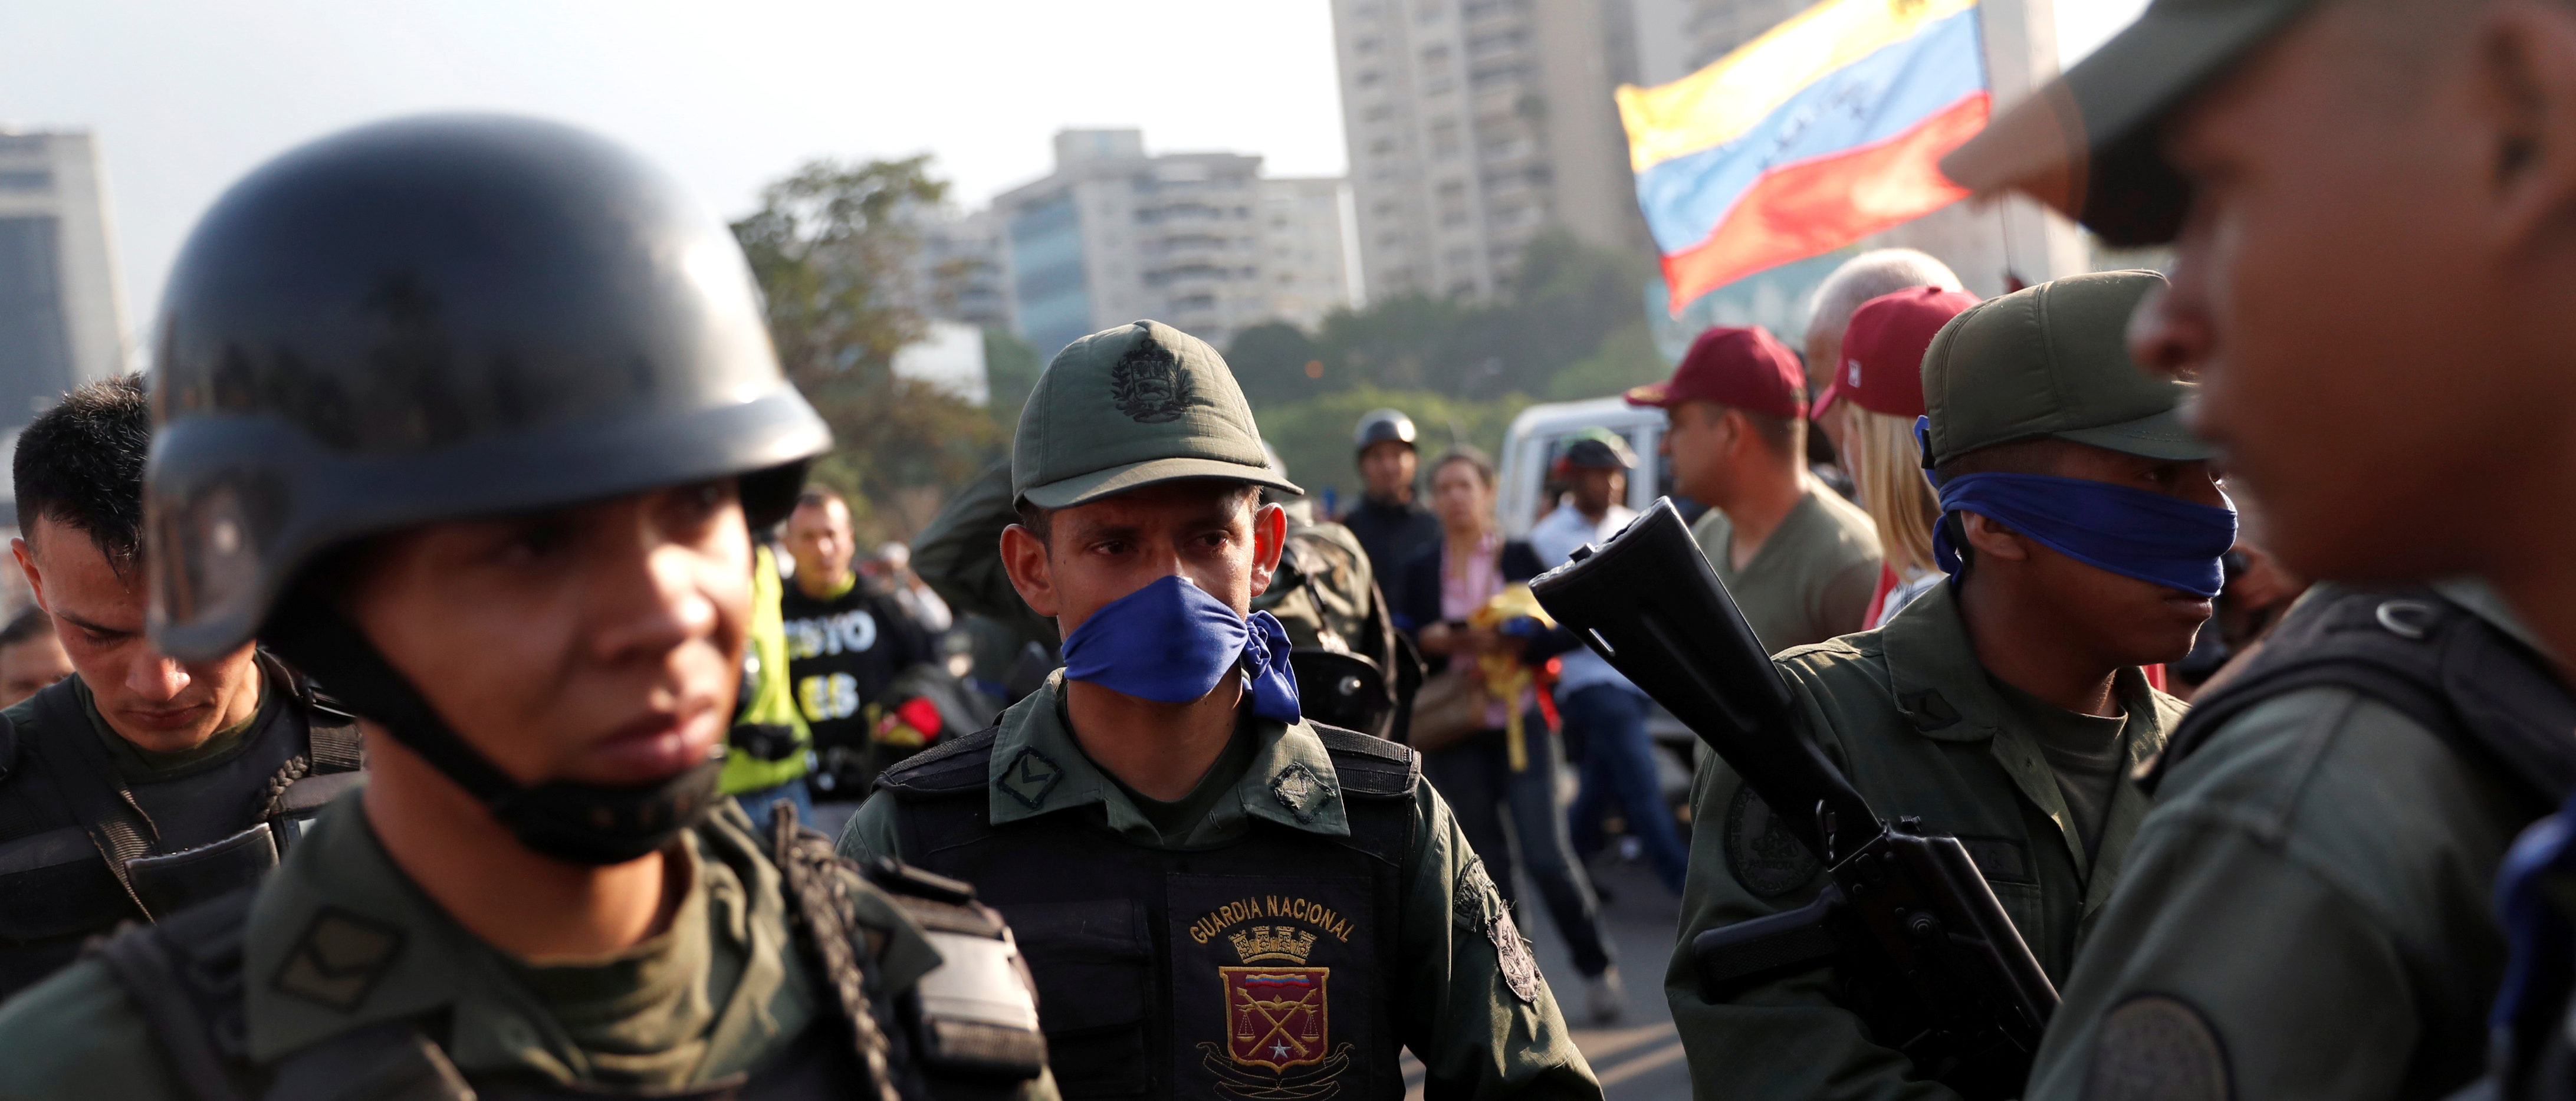 "Military members stand near the Generalisimo Francisco de Miranda Airbase ""La Carlota"", in Caracas, Venezuela April 30, 2019. REUTERS/Carlos Garcia Rawlins"